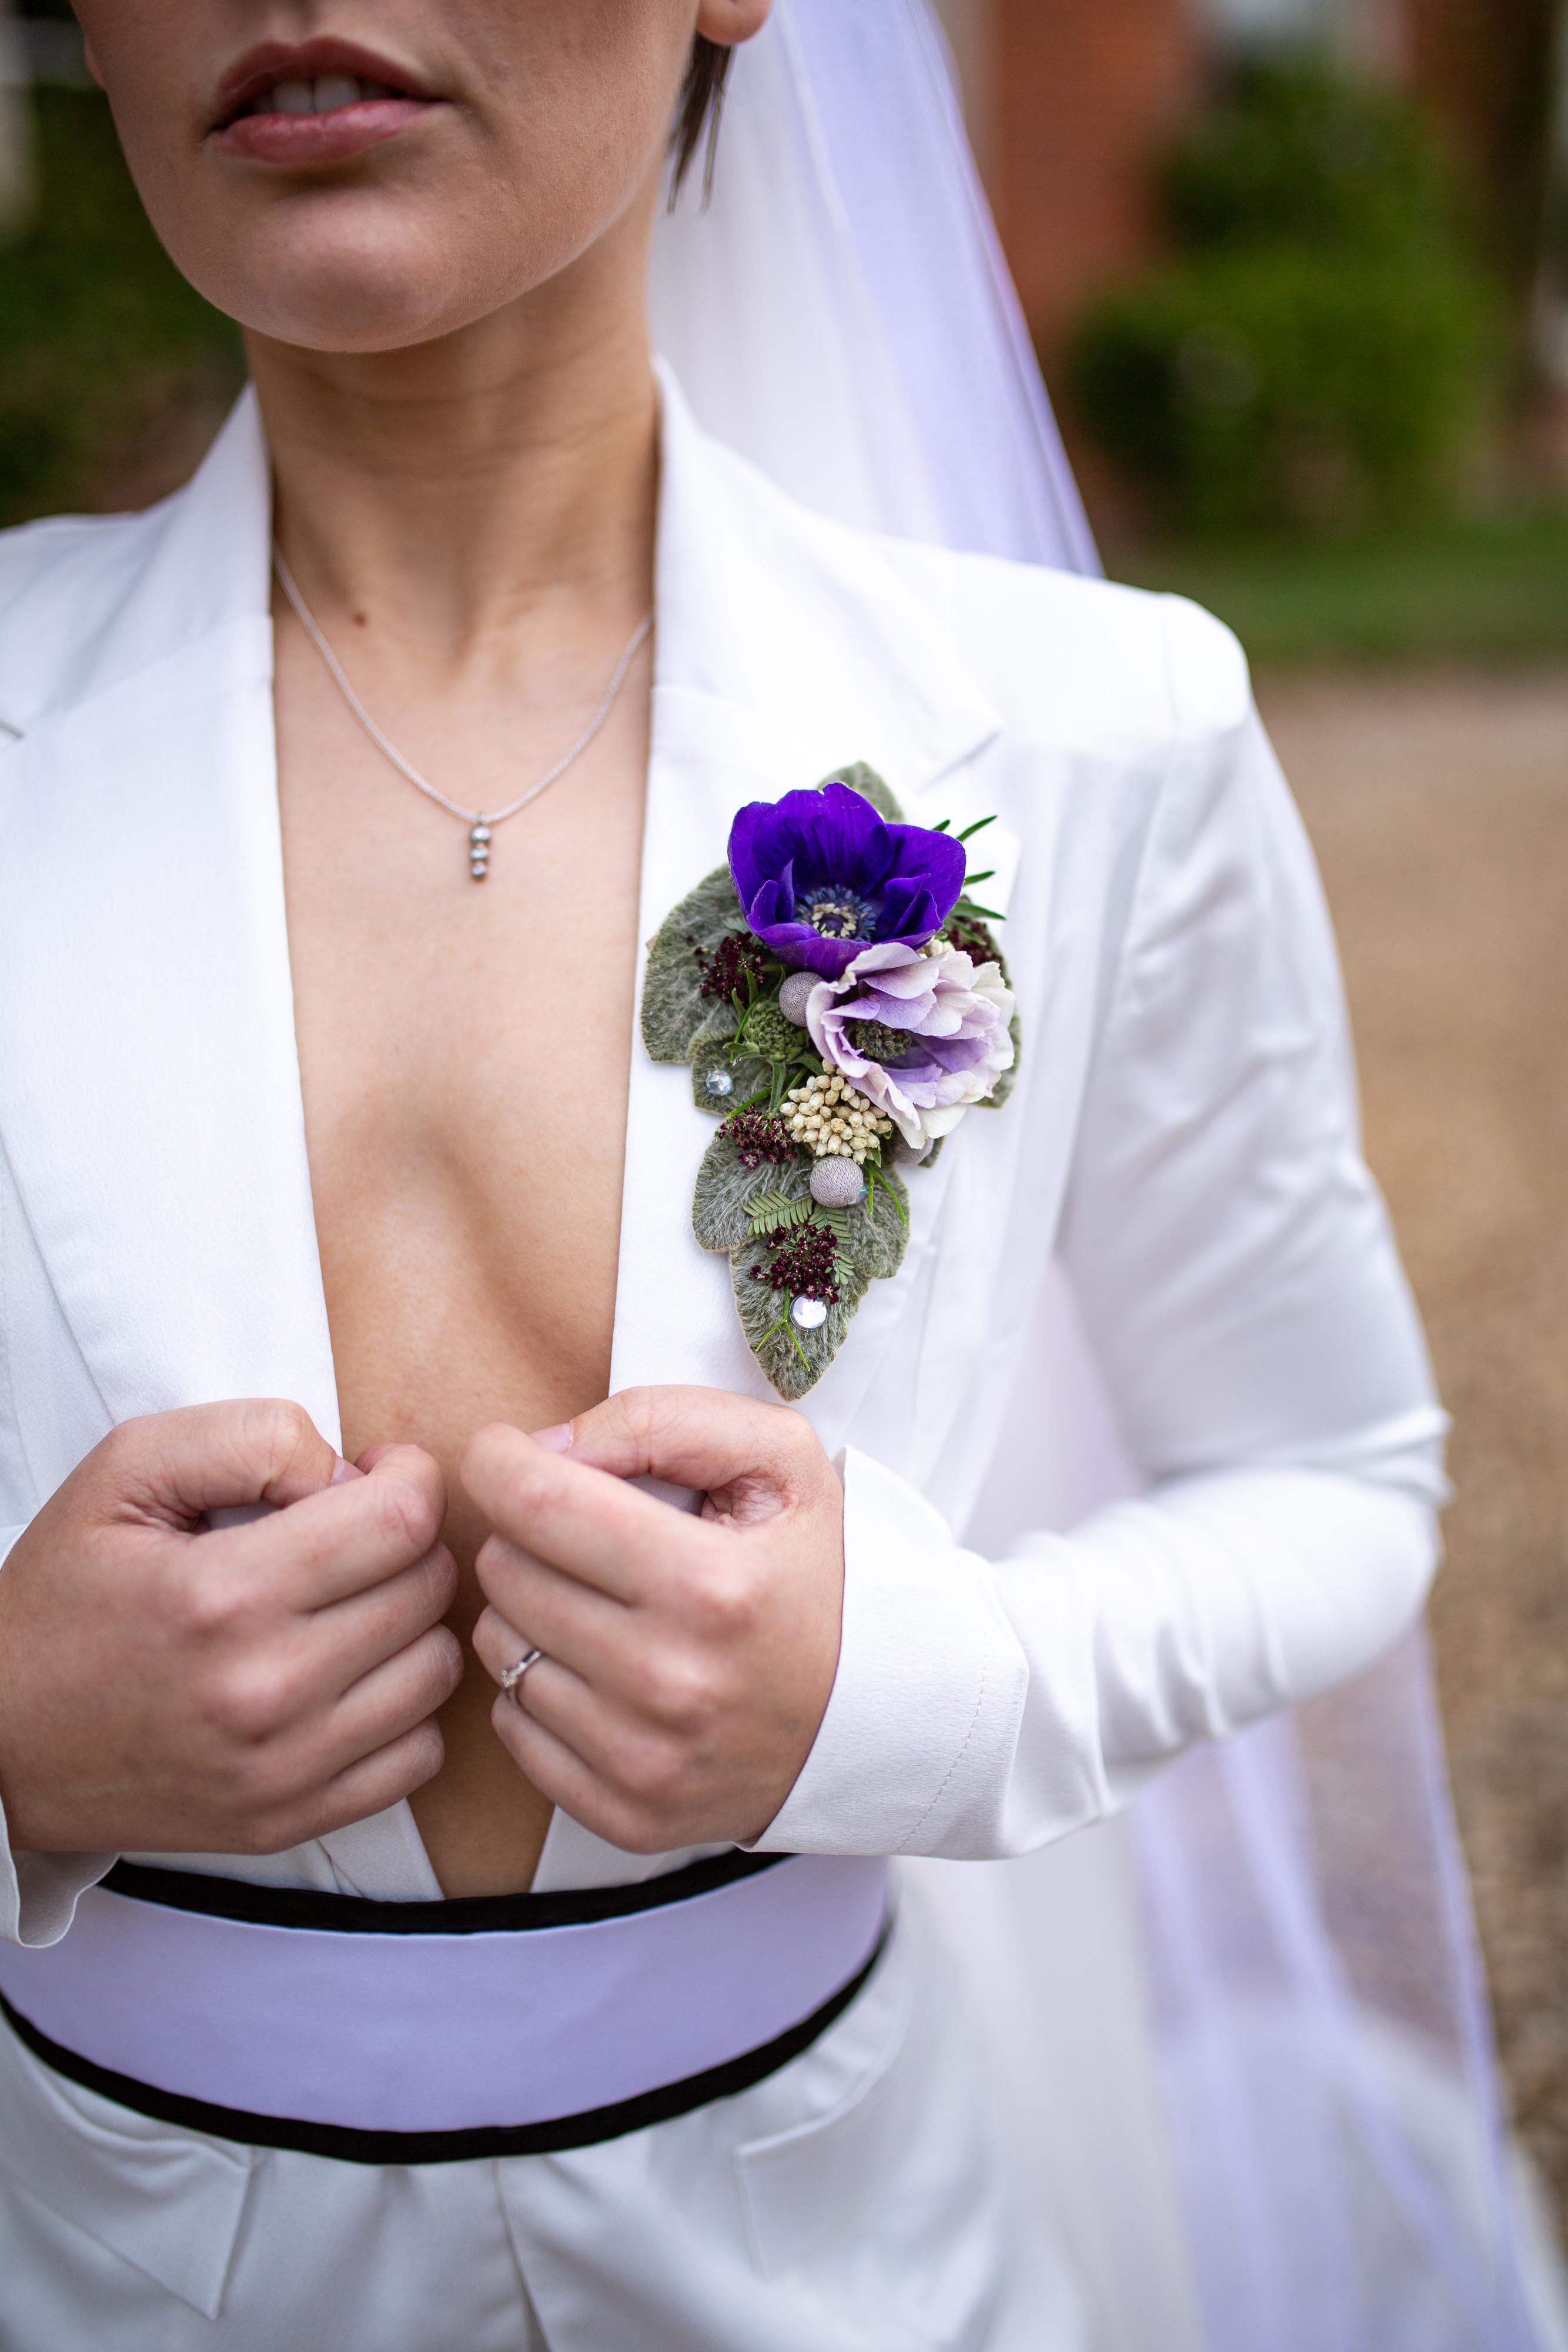 iconic wedding looks- music themed wedding- unconventional wedding- alternative wedding- womens white suit- alternative button hole- annie lennox style- womens wedding suit